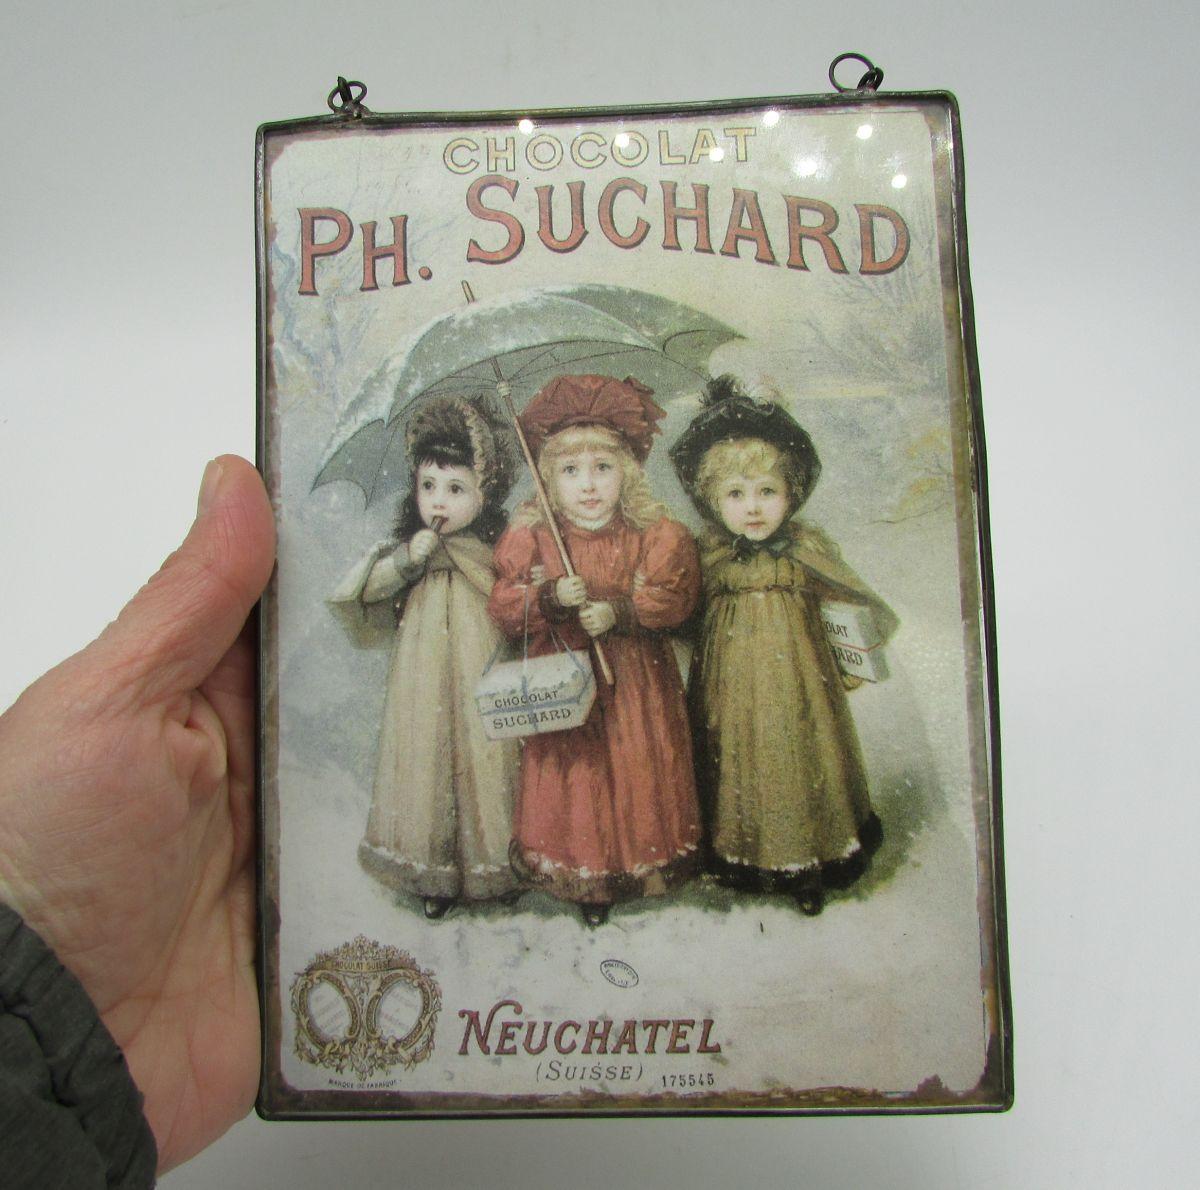 carte postale publicitaire chocolat Suchard sous verre - Luckyfind